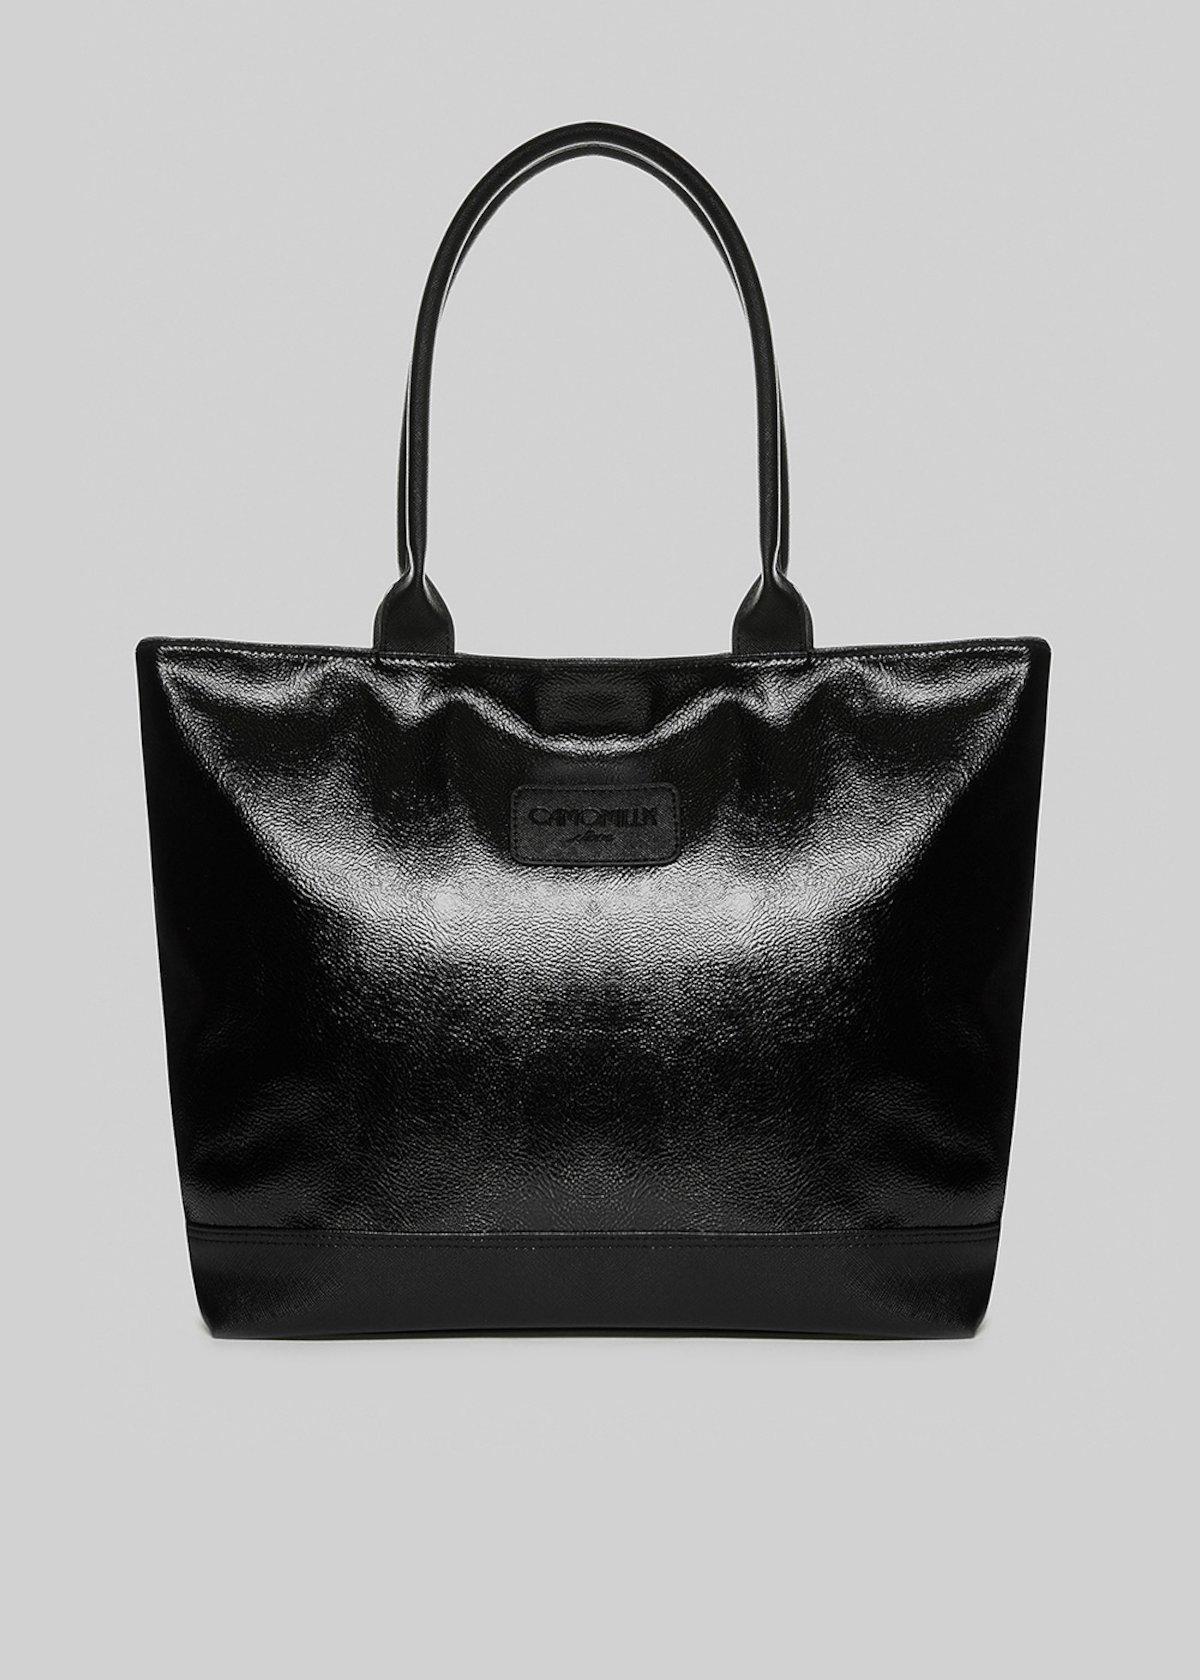 Trendmeta shopping bag with saffiano faux leather details - Black Metal